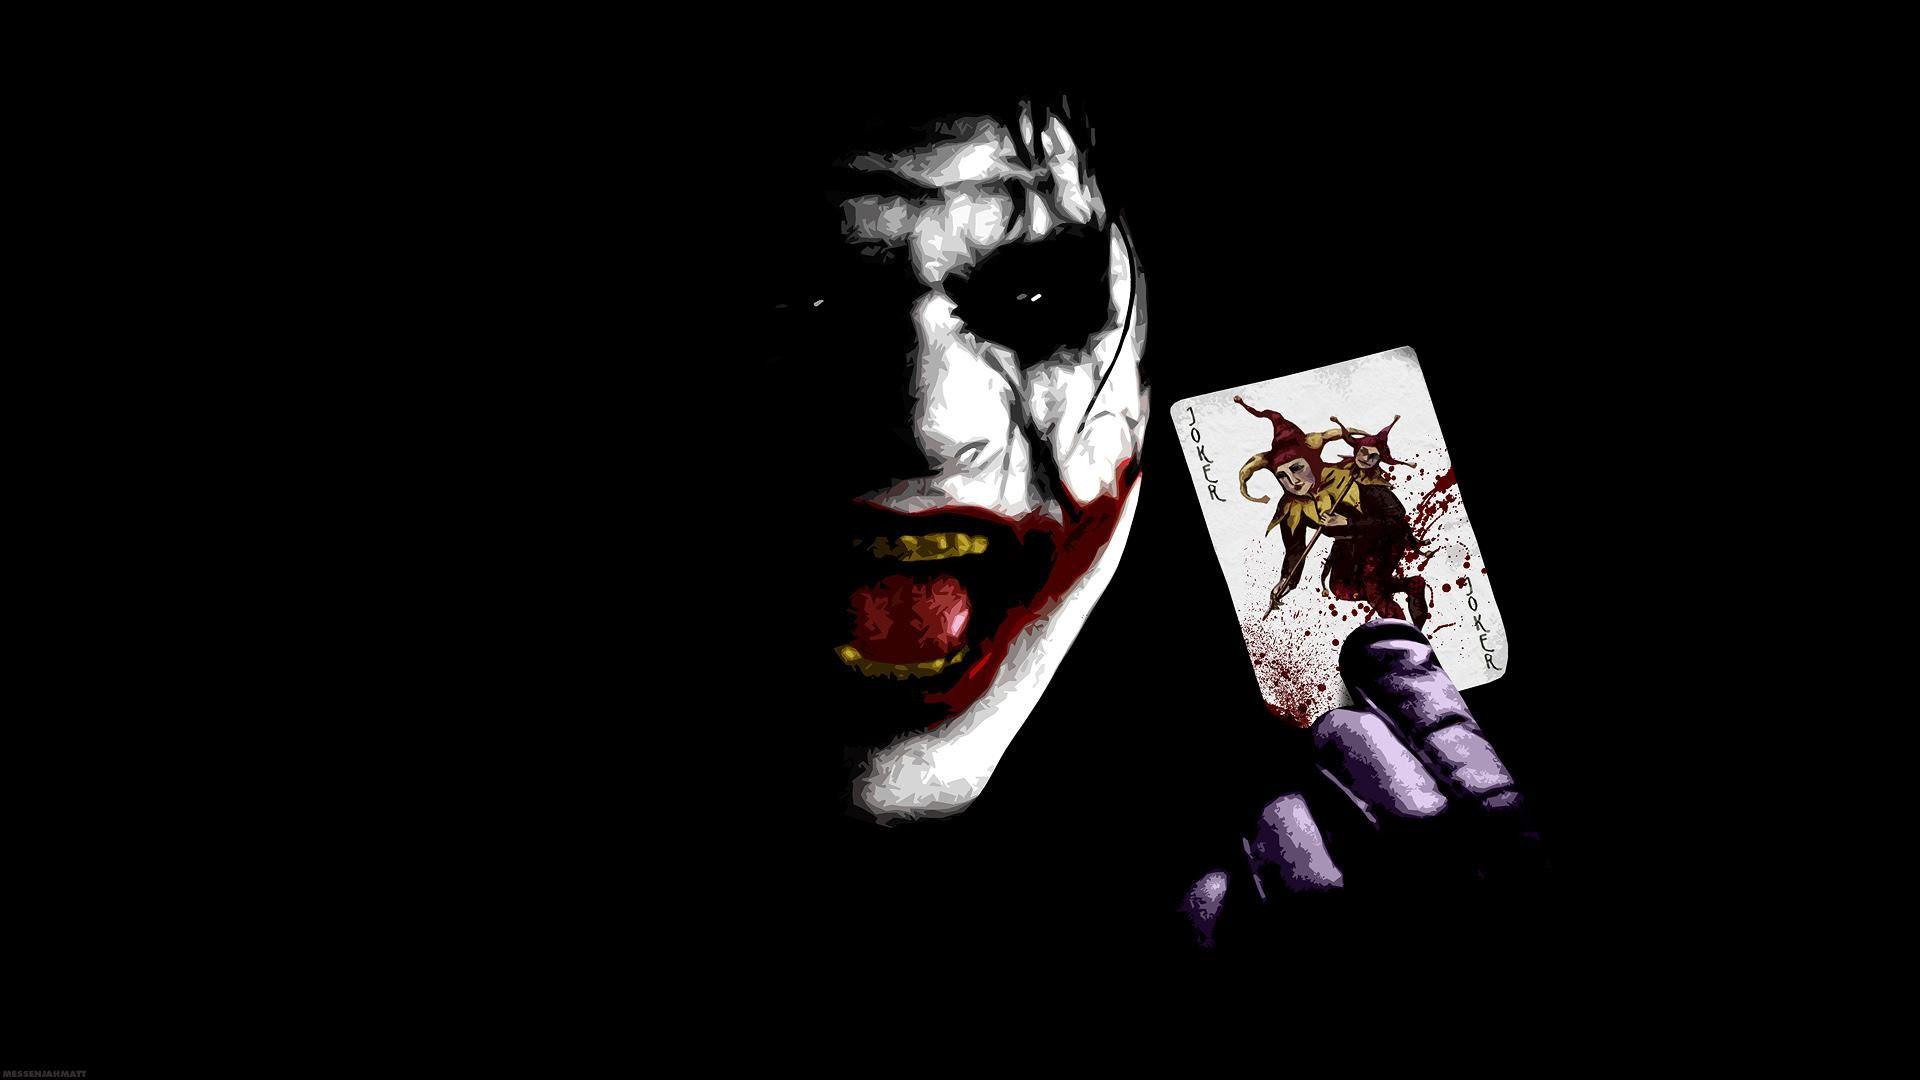 Iphone Scary Joker Wallpaper Hd - wallpaper